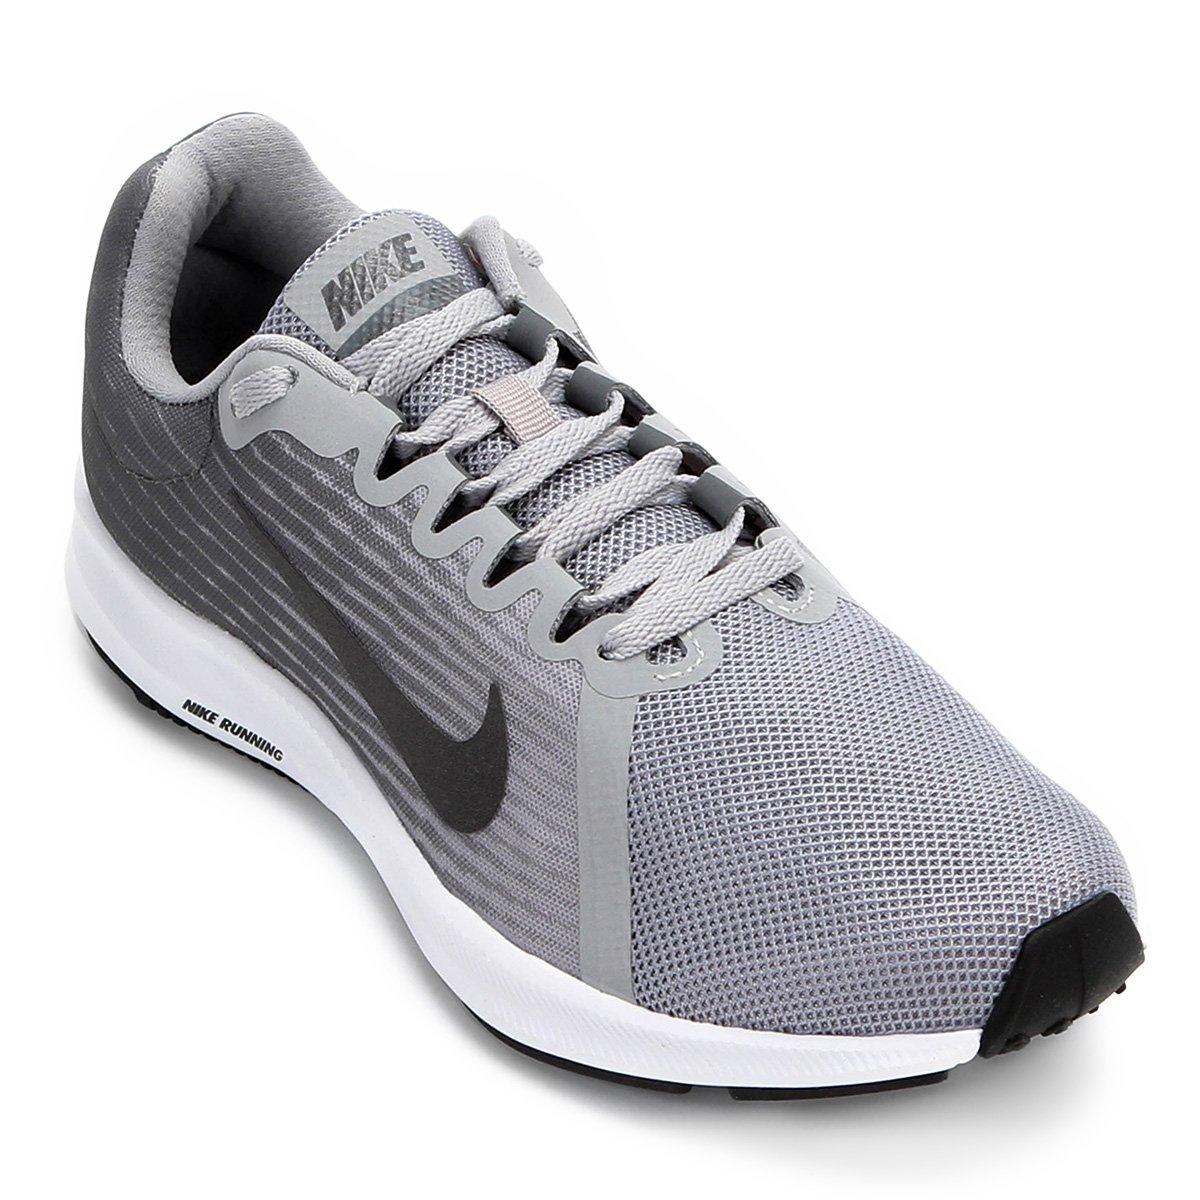 Tênis Nike Wmns Downshifter 8 Feminino - Cinza e Preto - Compre Agora  313a382f50